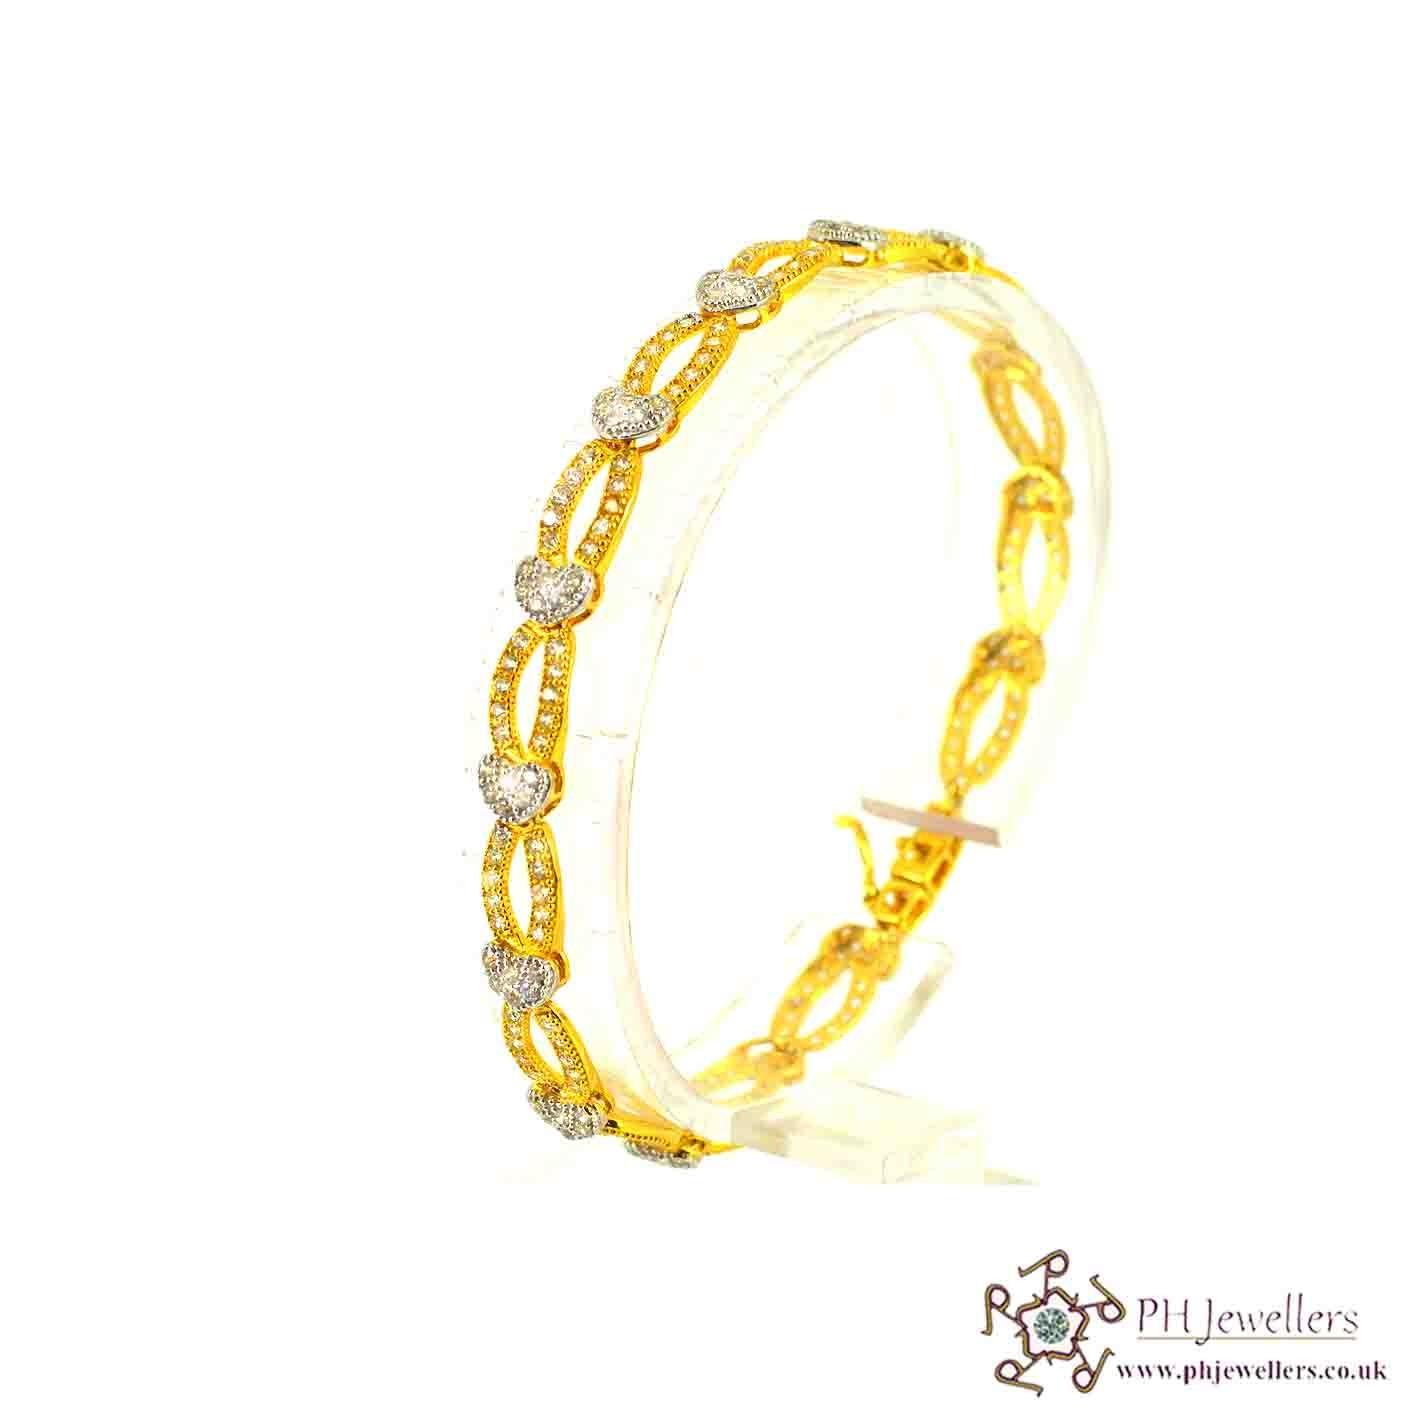 22ct 916 Hallmark Yellow Gold Bracelet CZ LB20